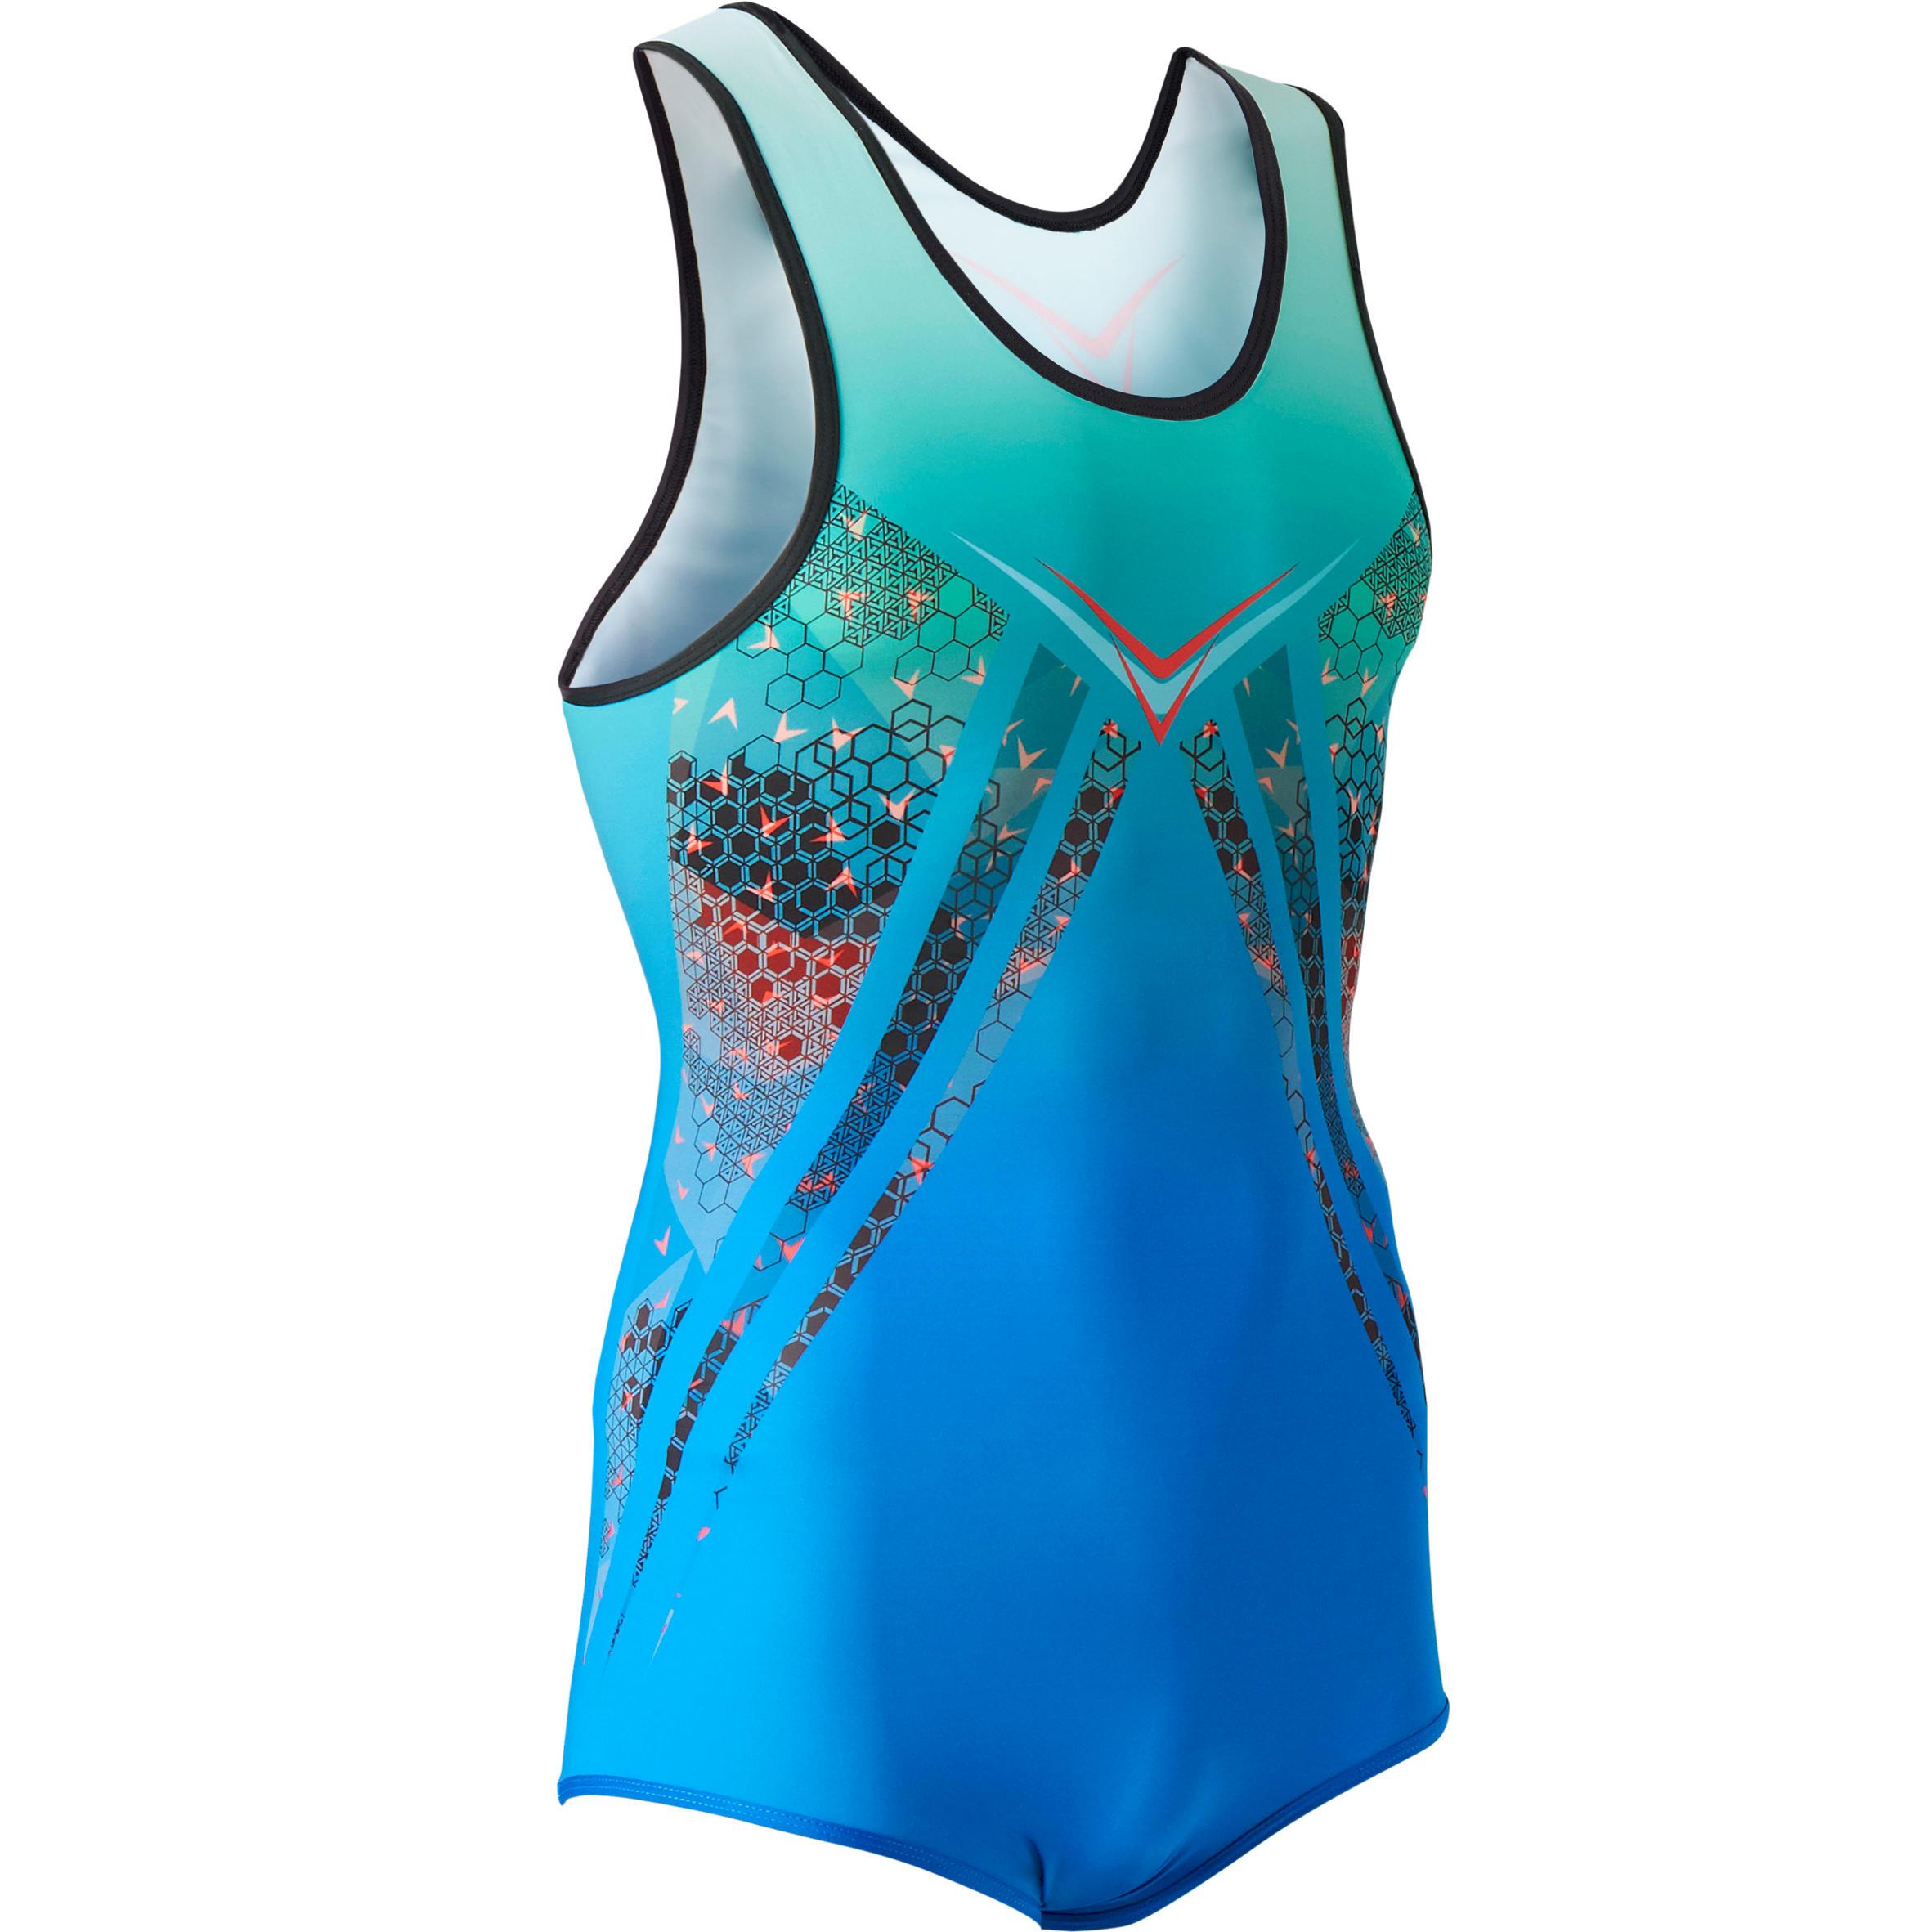 Body 500 Gimnastică Artistică la Reducere poza